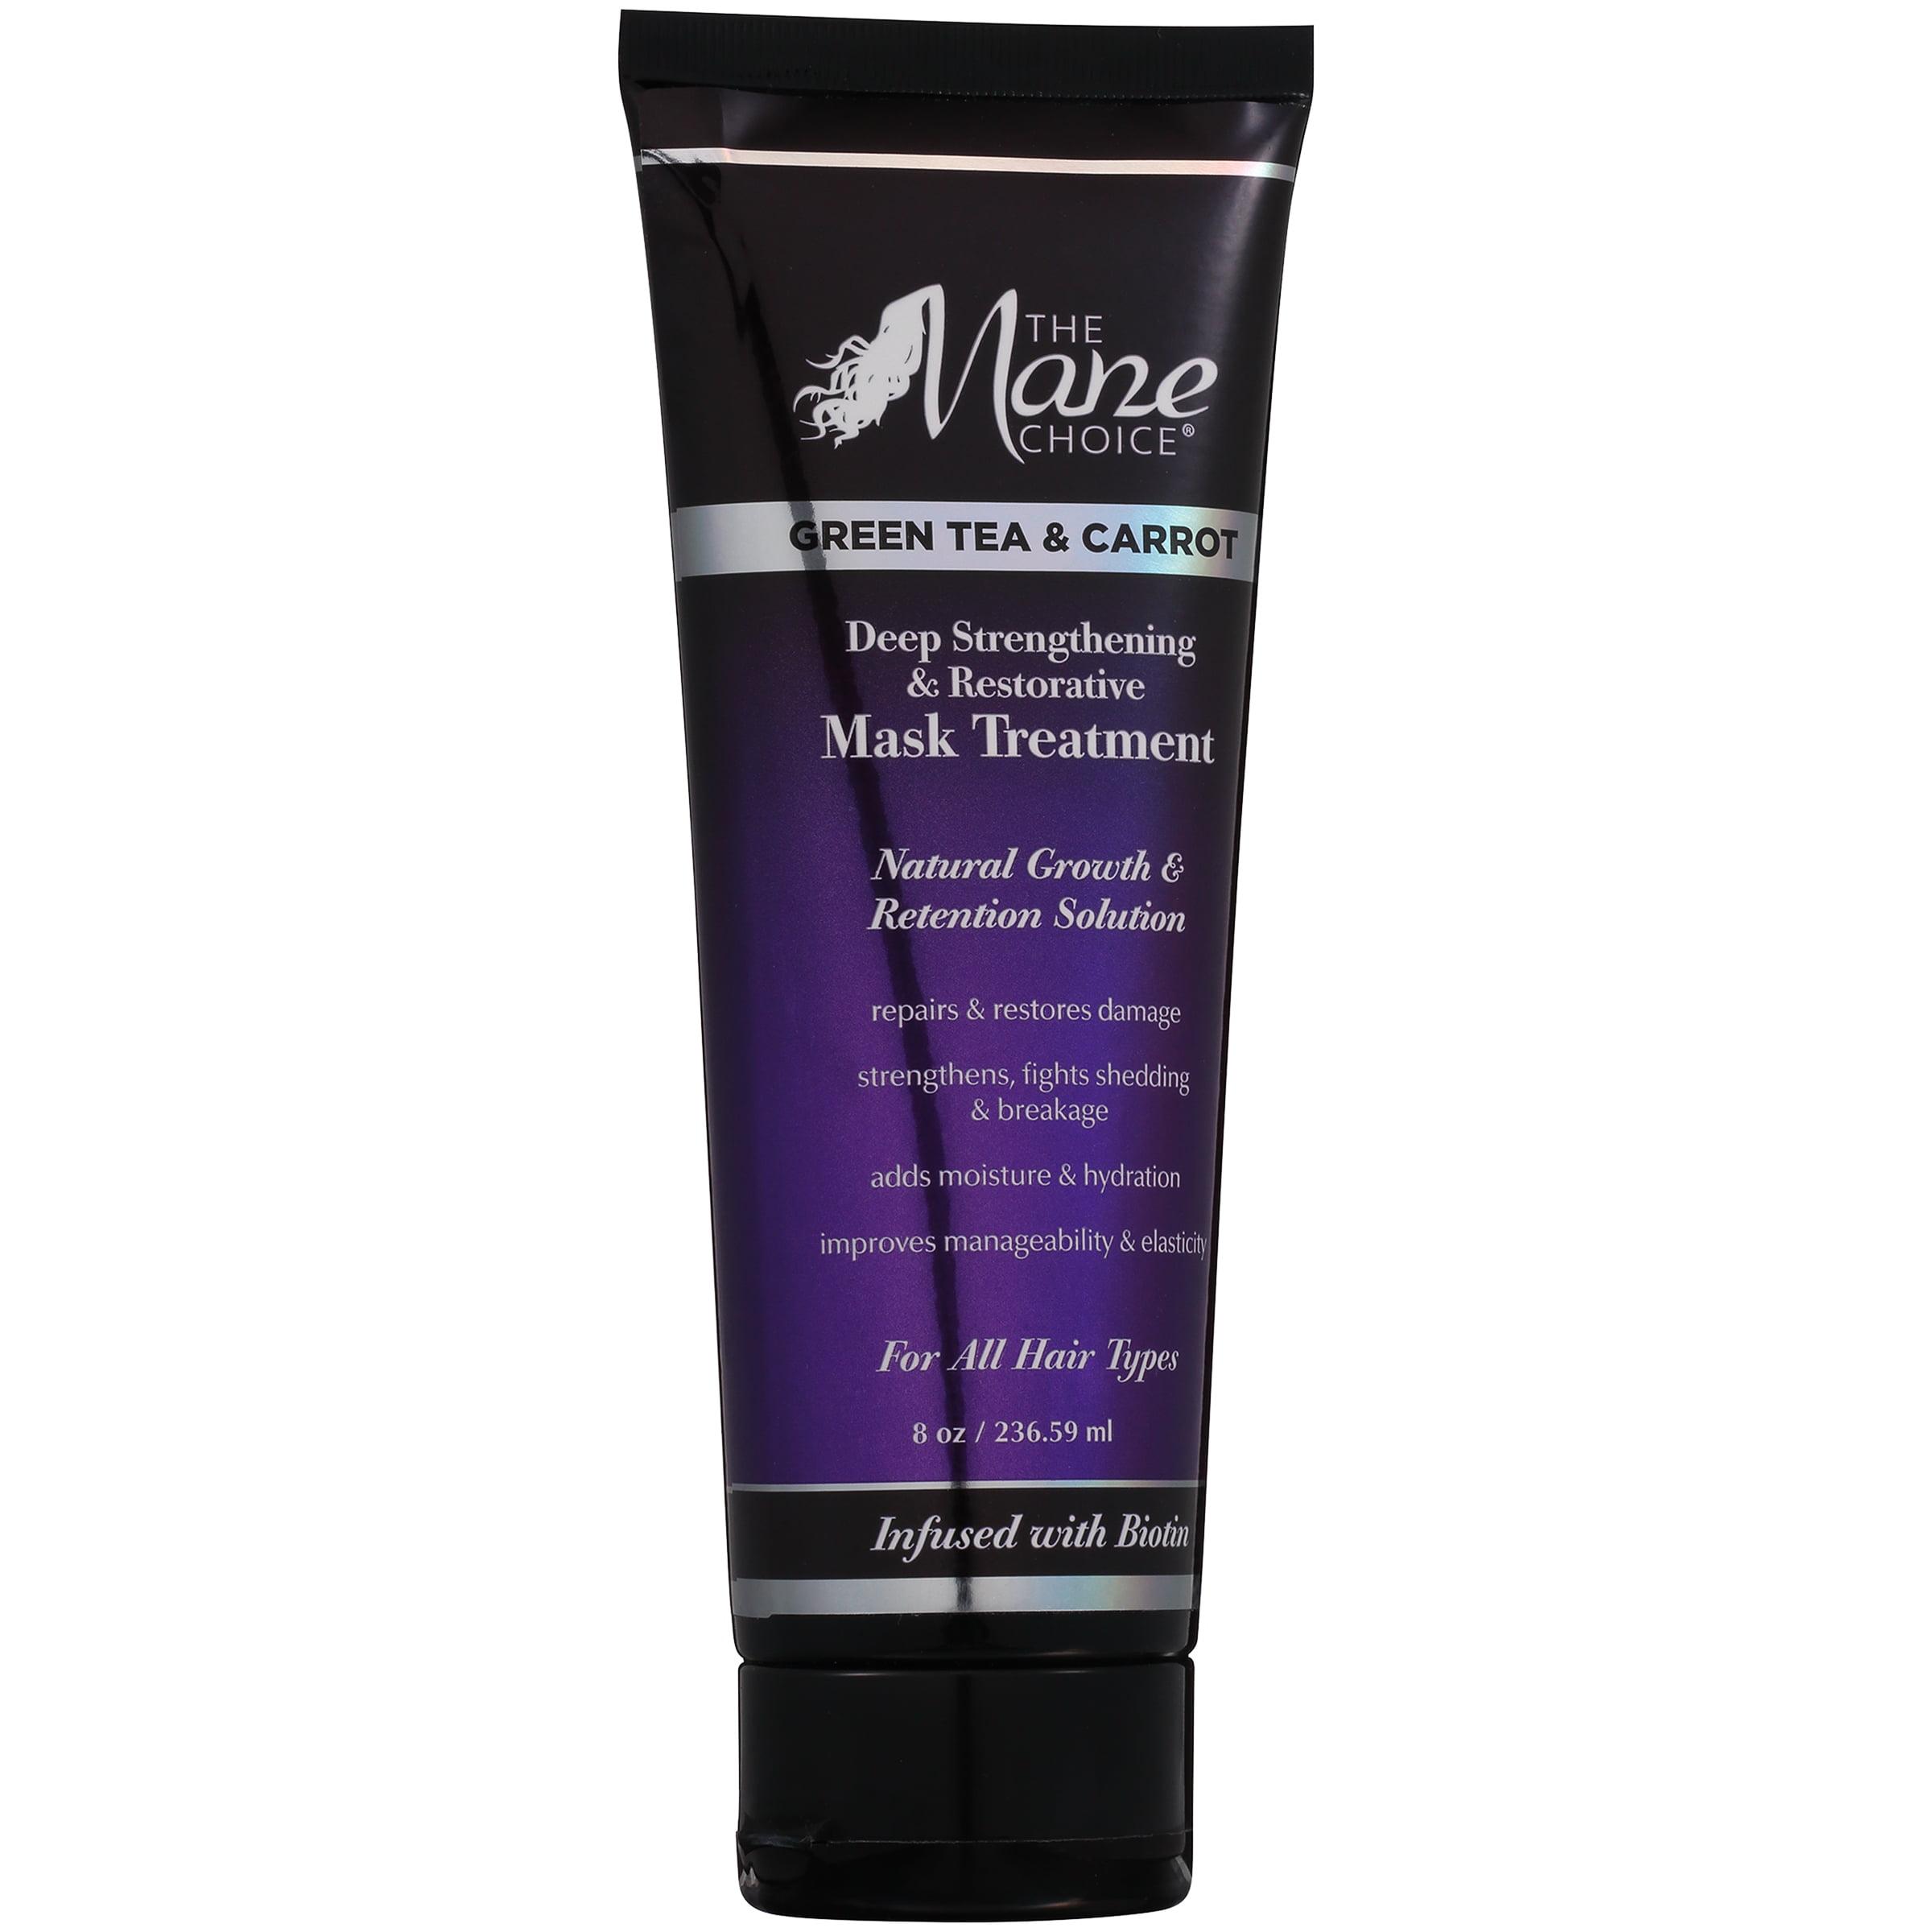 The Mane Choice® Deep Strengthening & Restorative Mask Treatment Green Tea & Carrot 8 oz. Tube